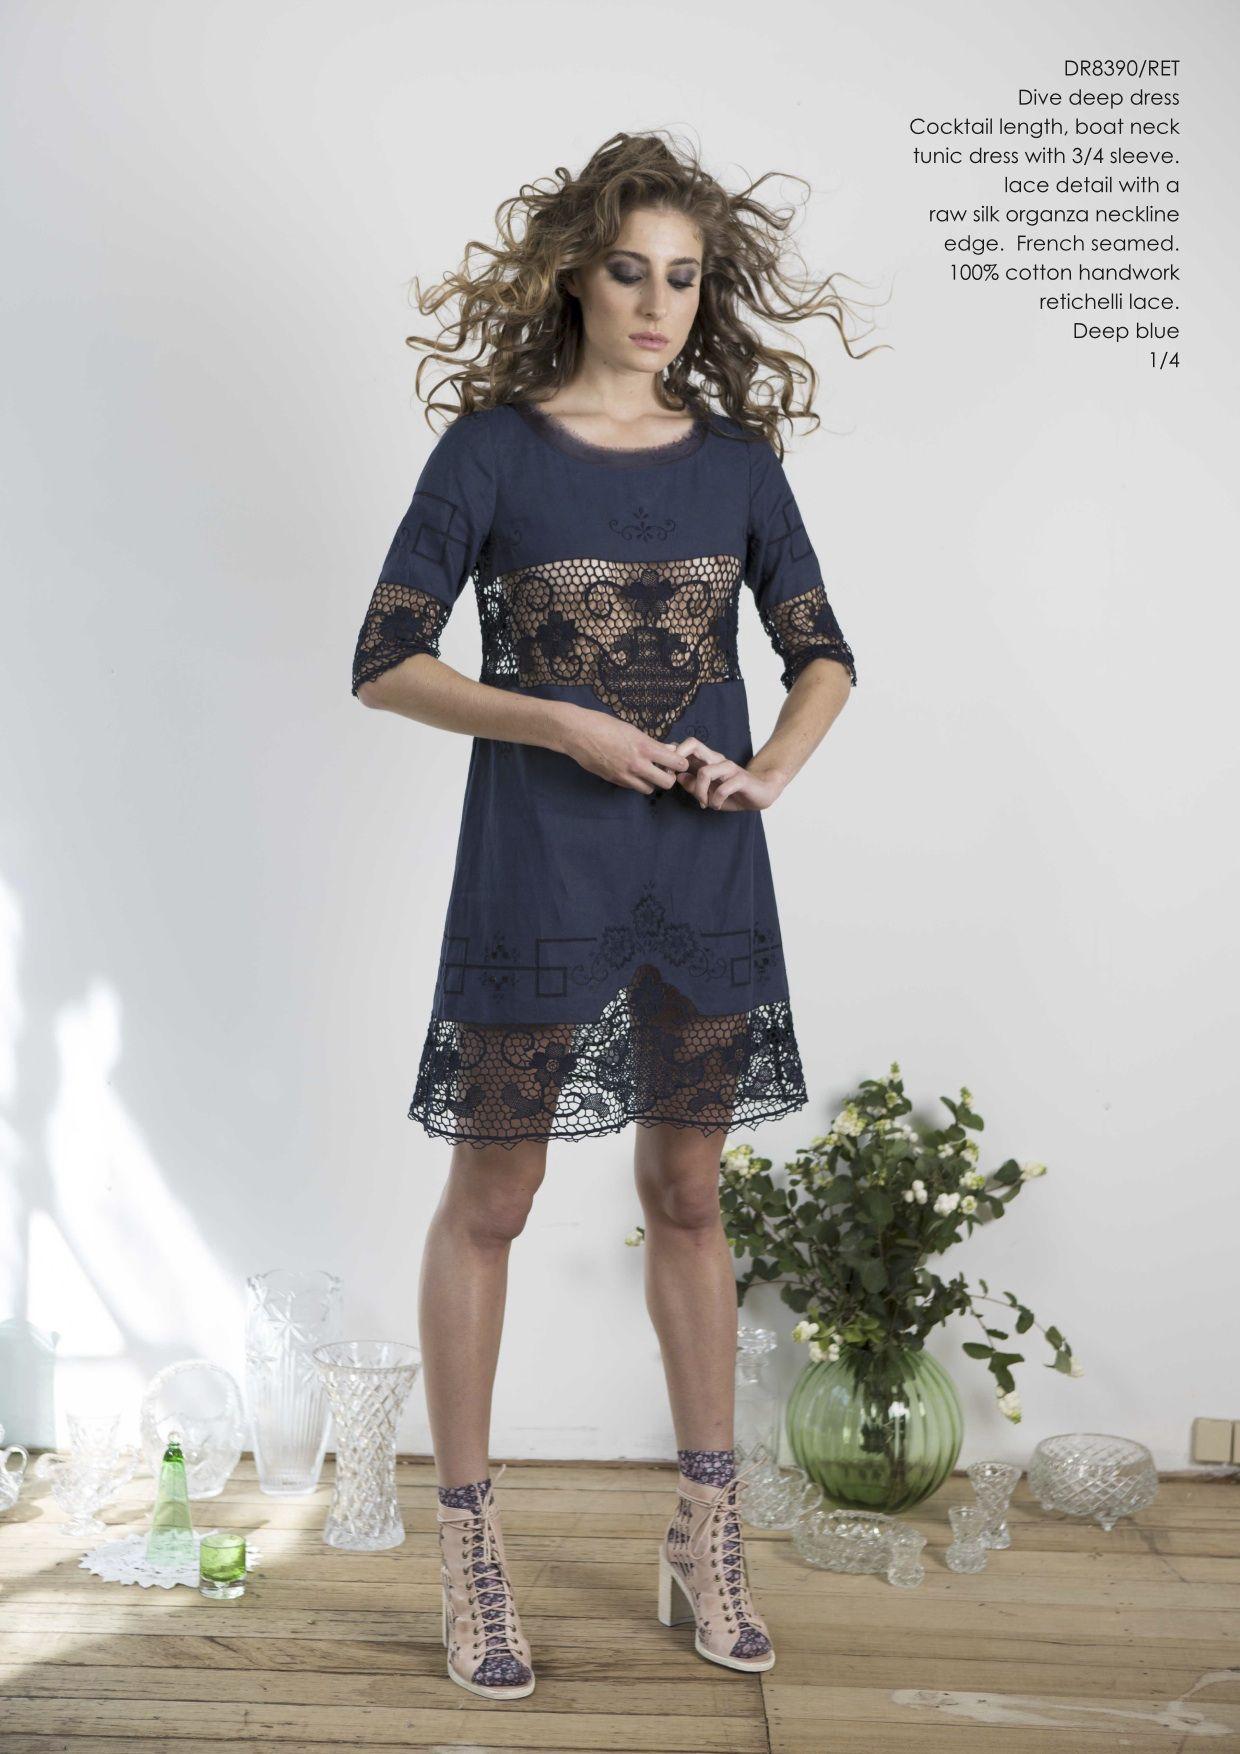 #nevenka #madeinmelbourne #melbourne #fashion #vintage #european #lace #collection #love #fashion #boutique #custom #floral #flower #fabric #bespoke www.nevenka.com.au